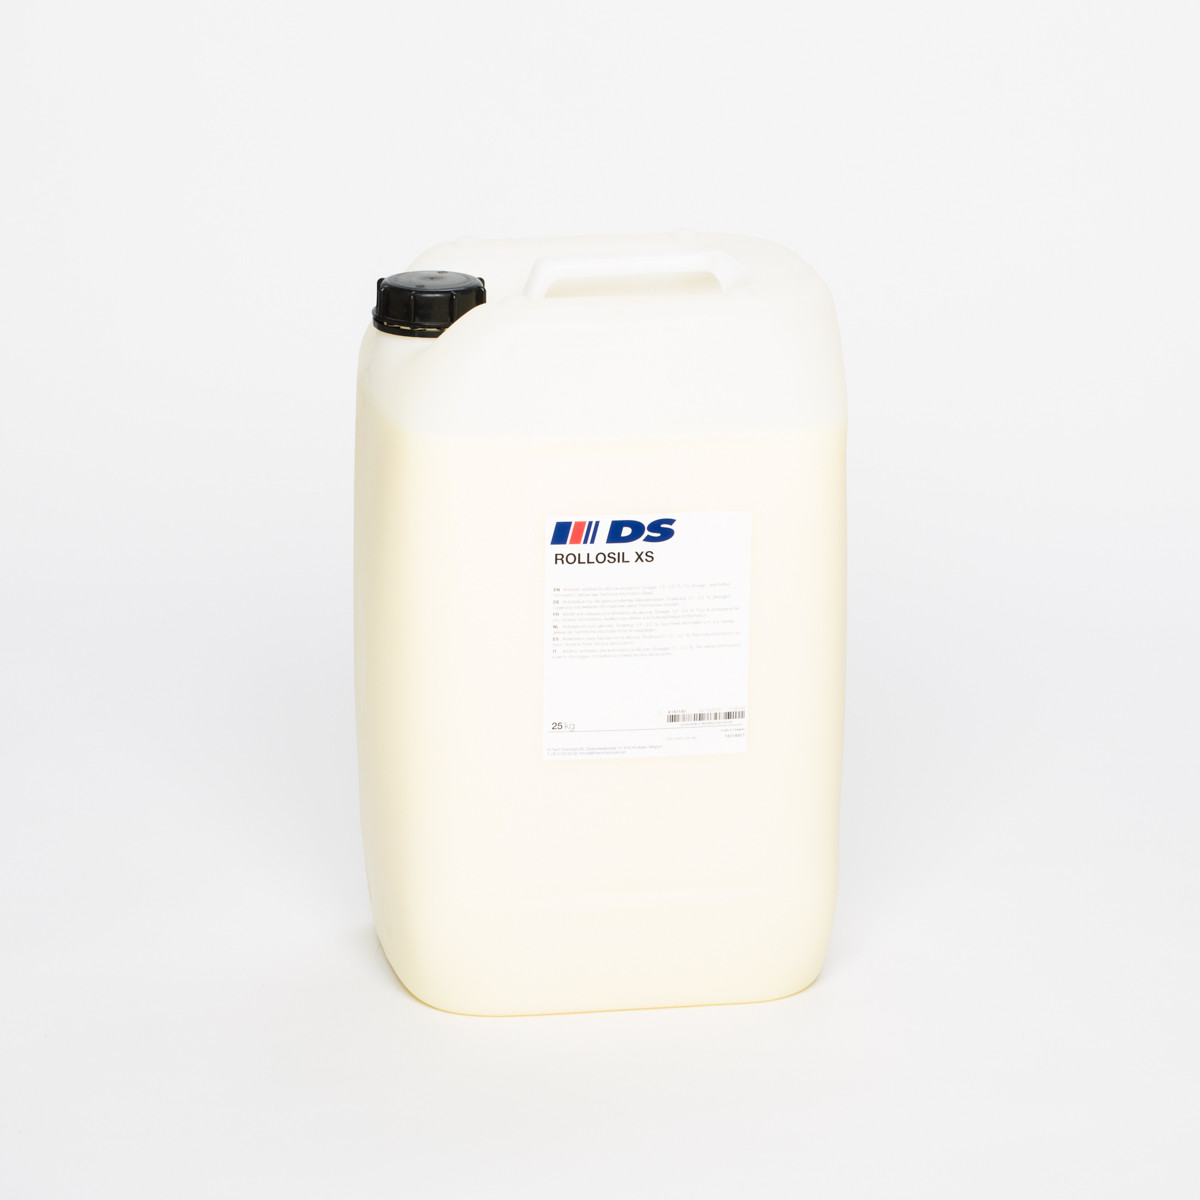 ROLLOSIL XS 25 kg-antistatik